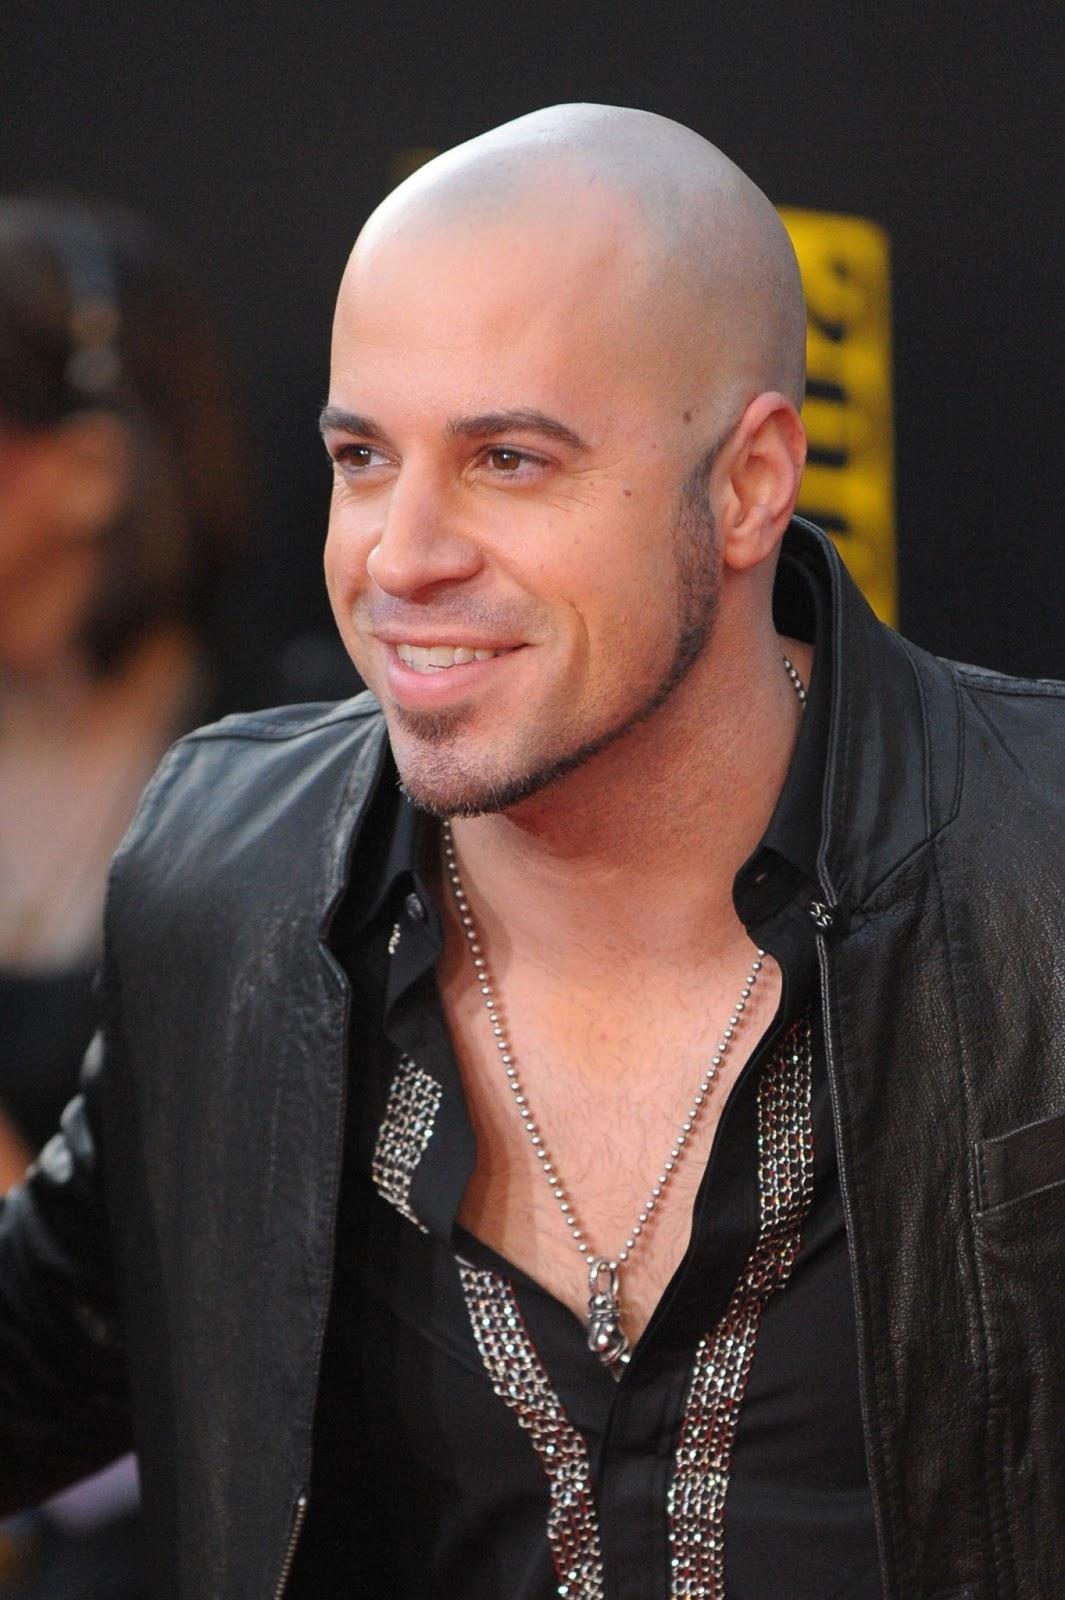 Chris Daughtry HairStyle (Men HairStyles)